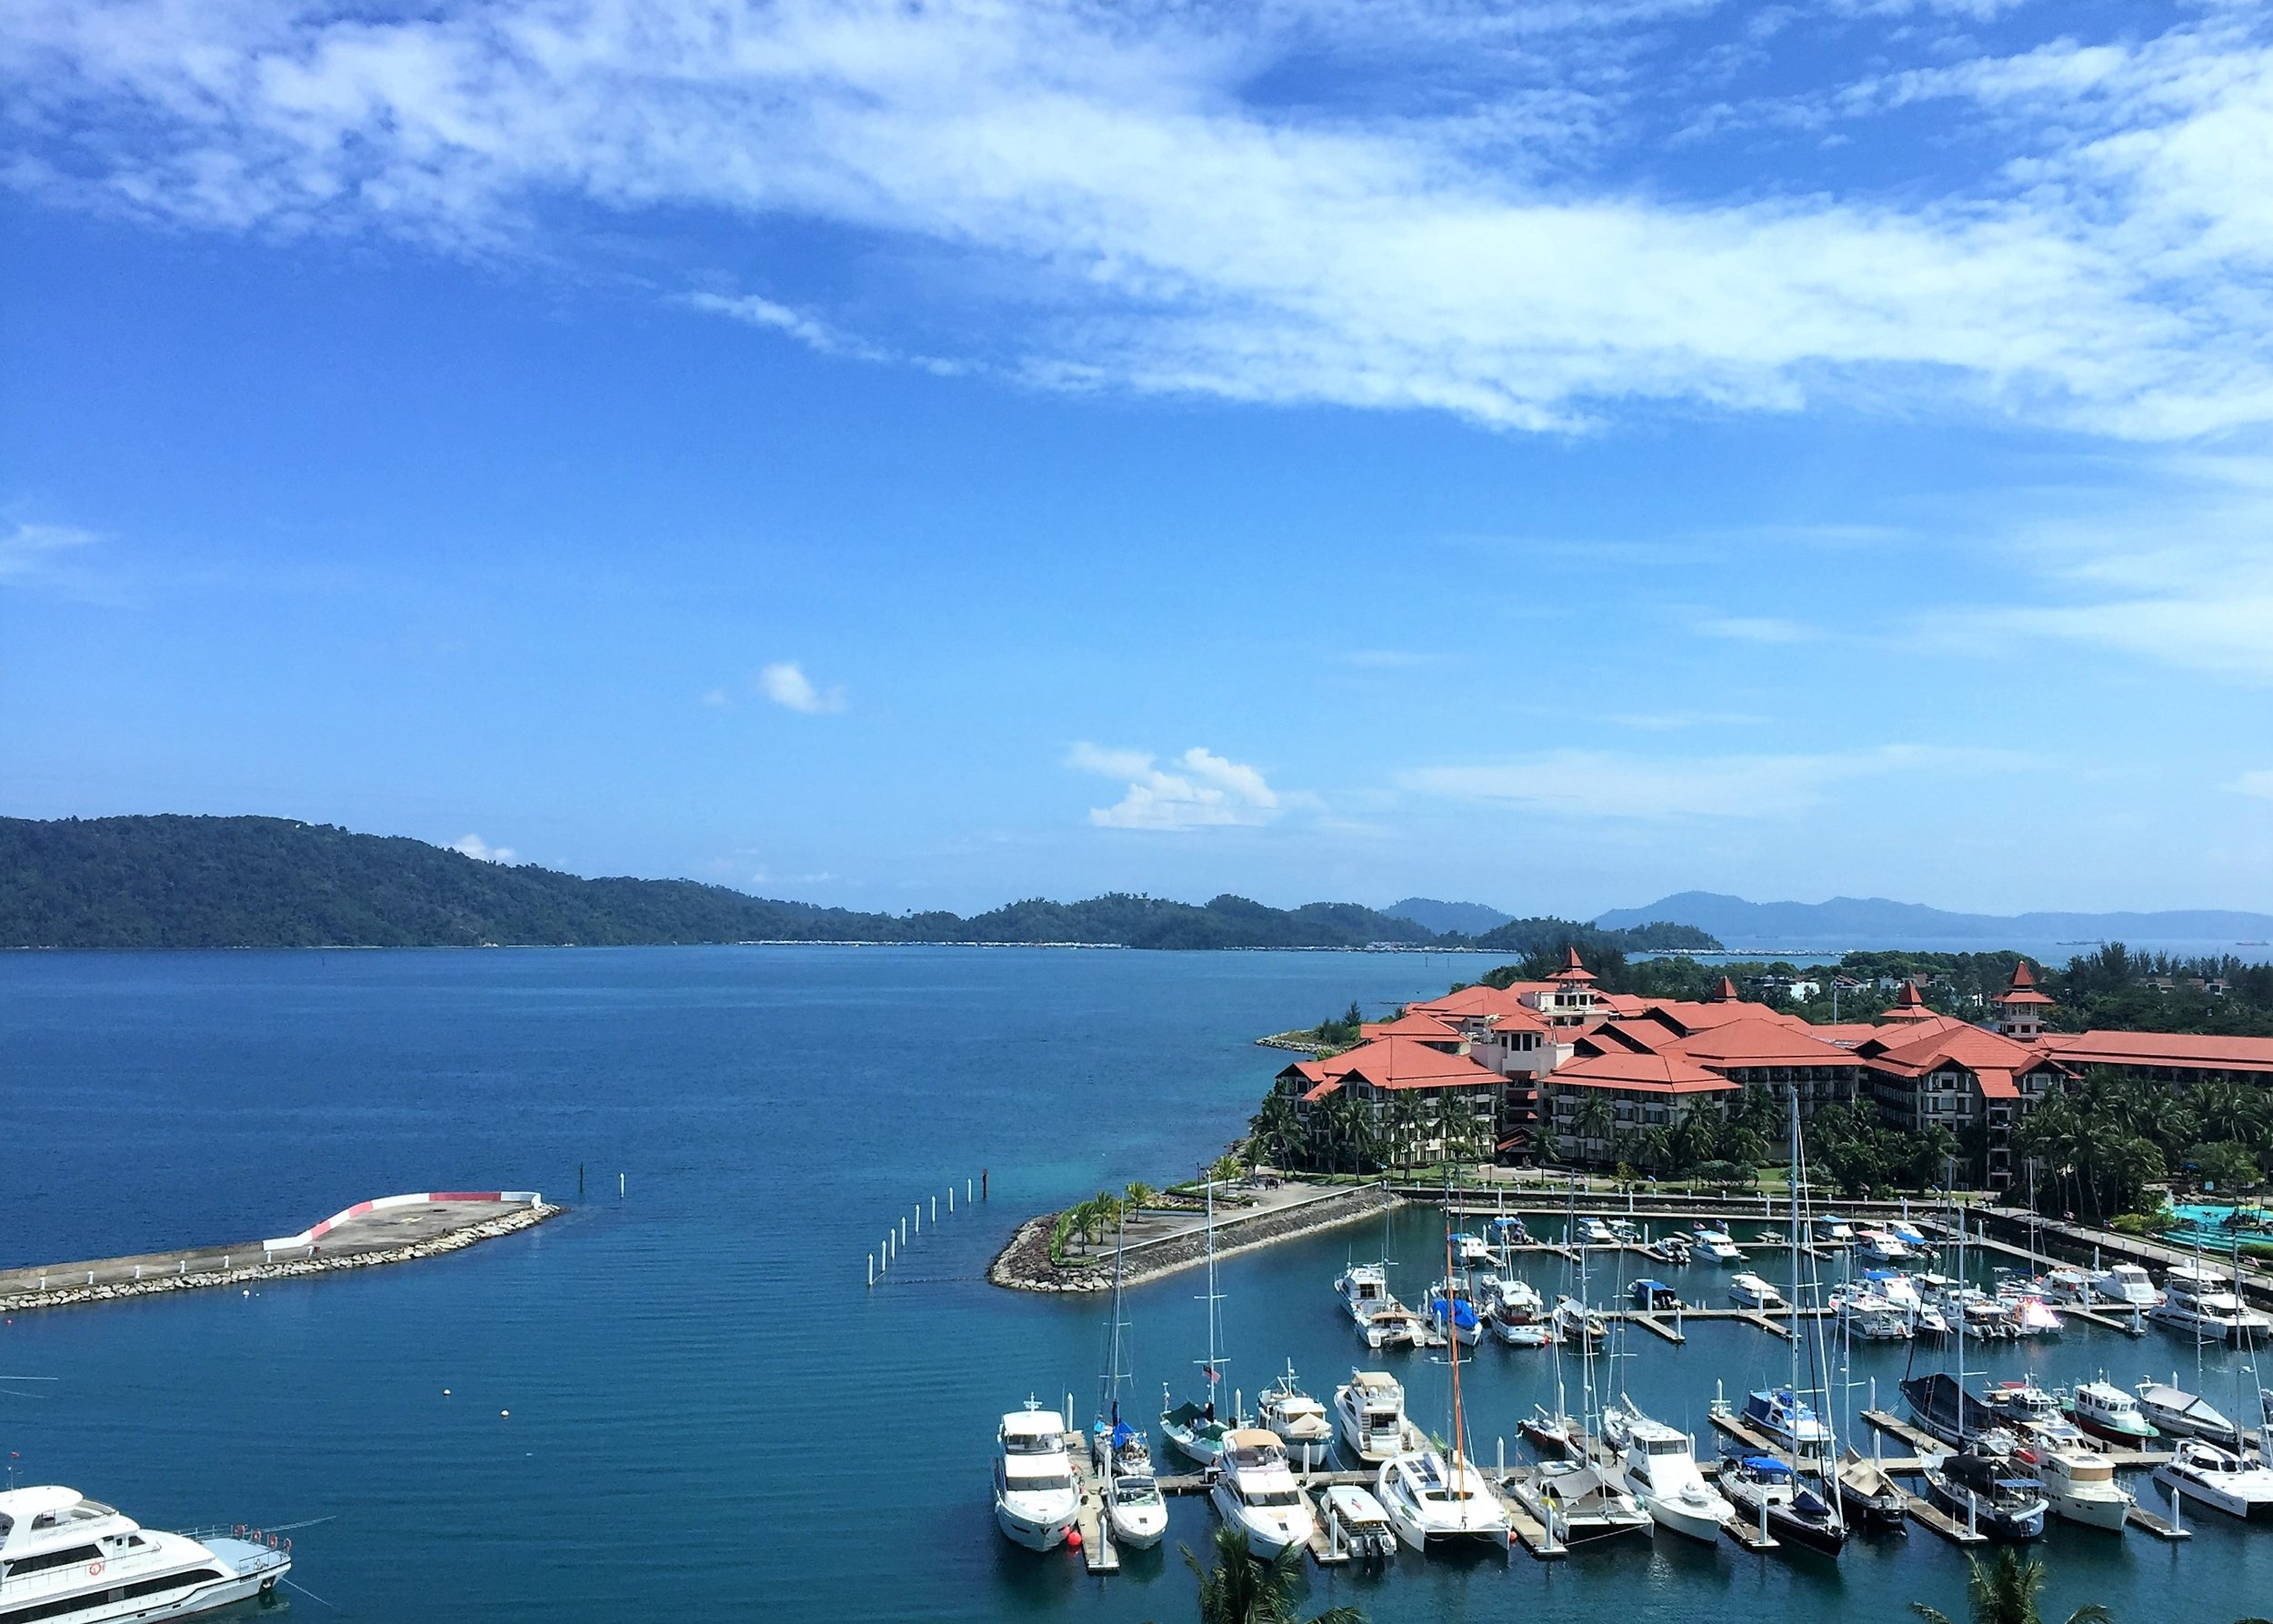 Sutera Harbour Marina & Country Club